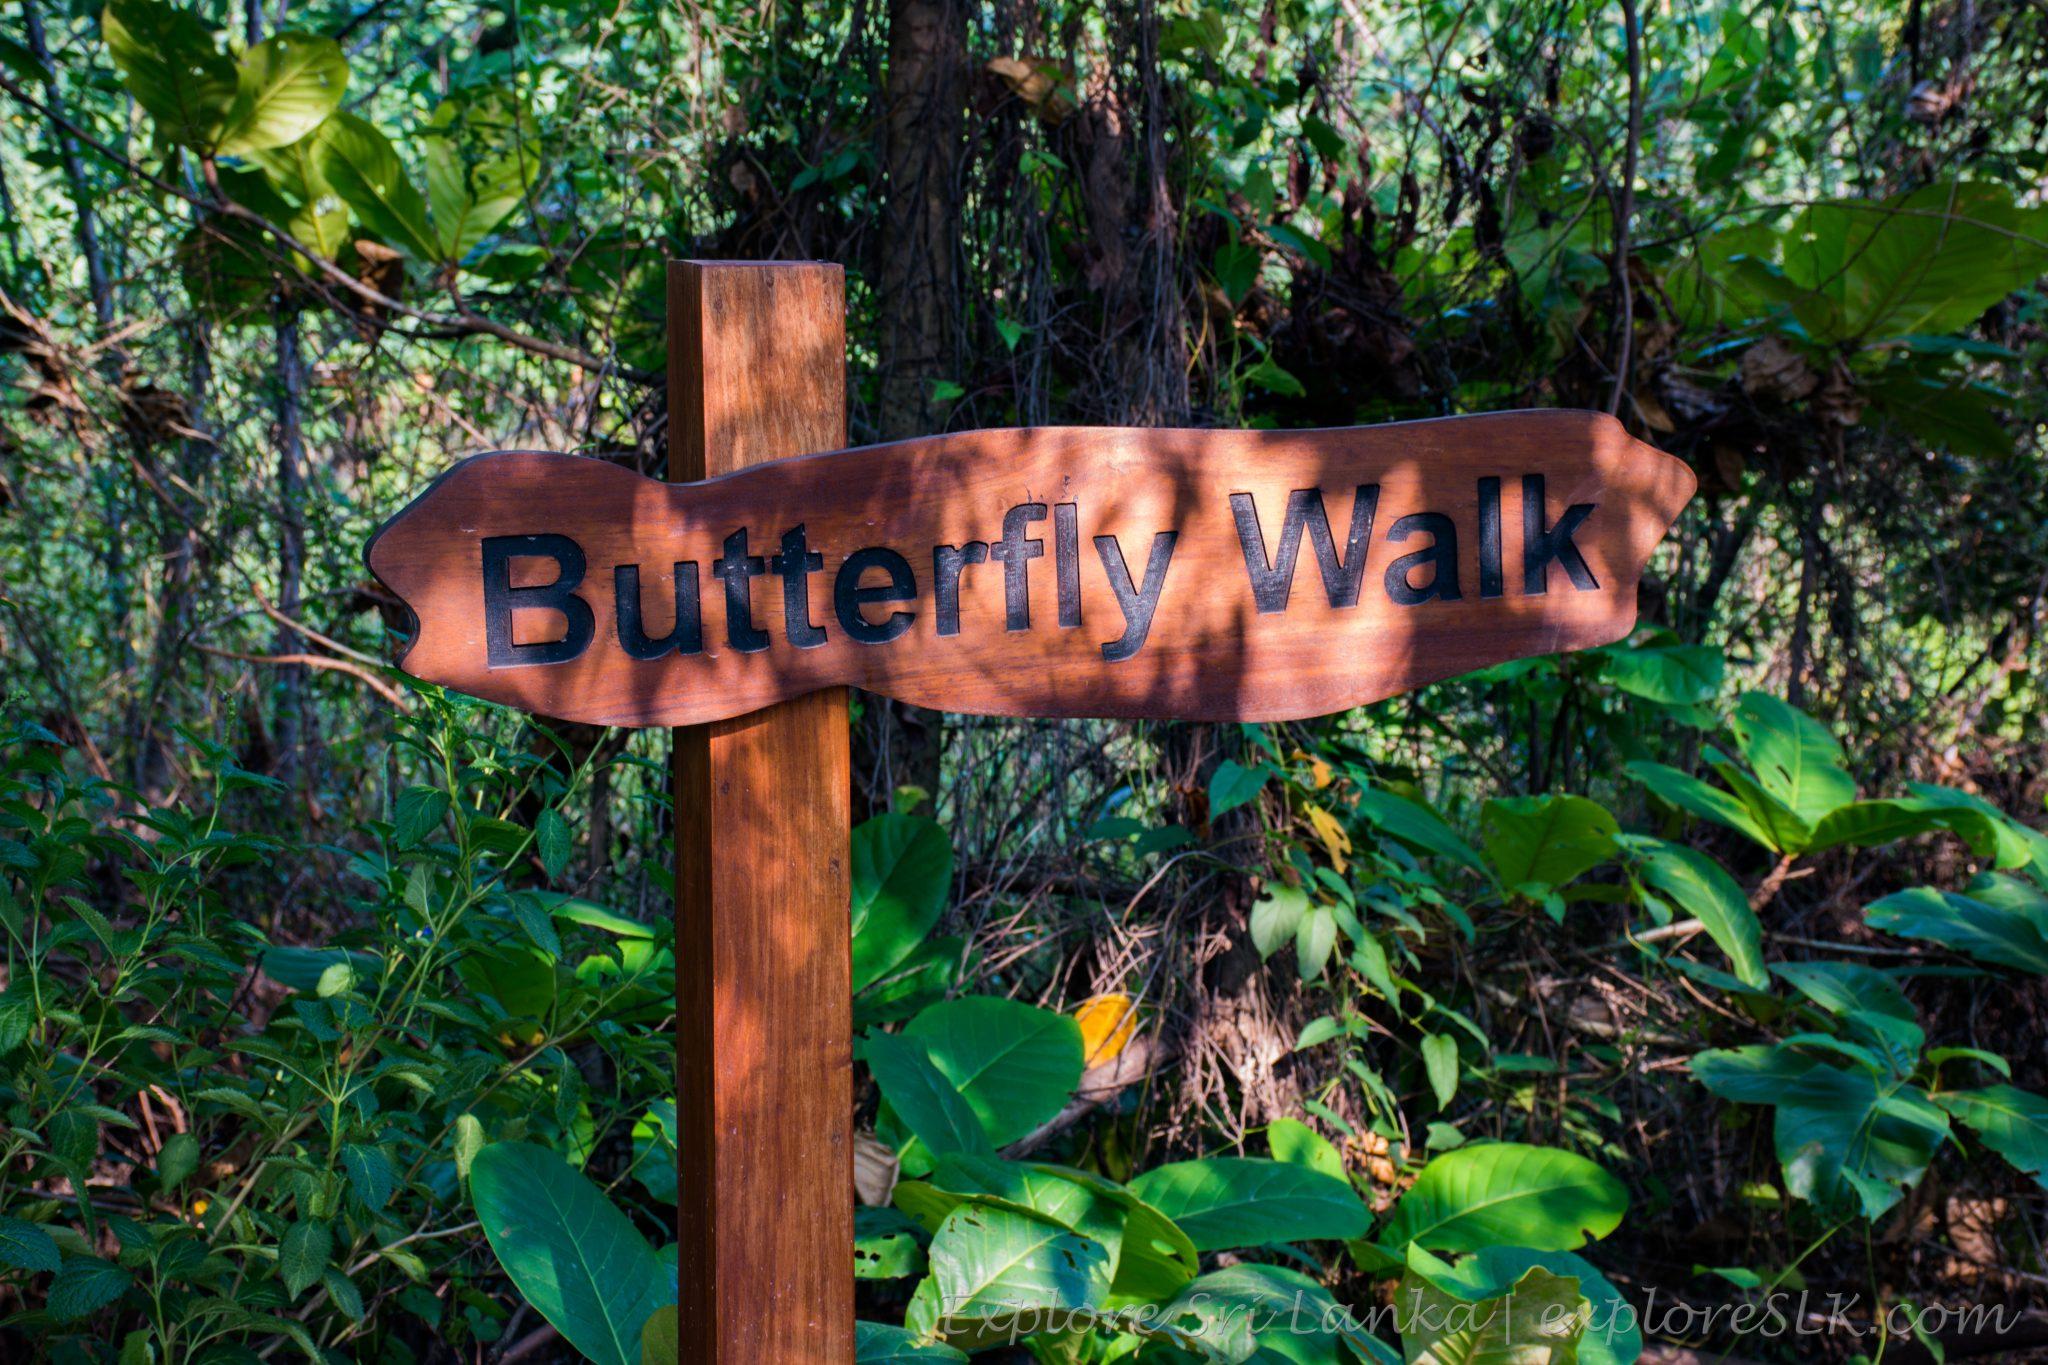 Butterfly Walk - Beddagana Park